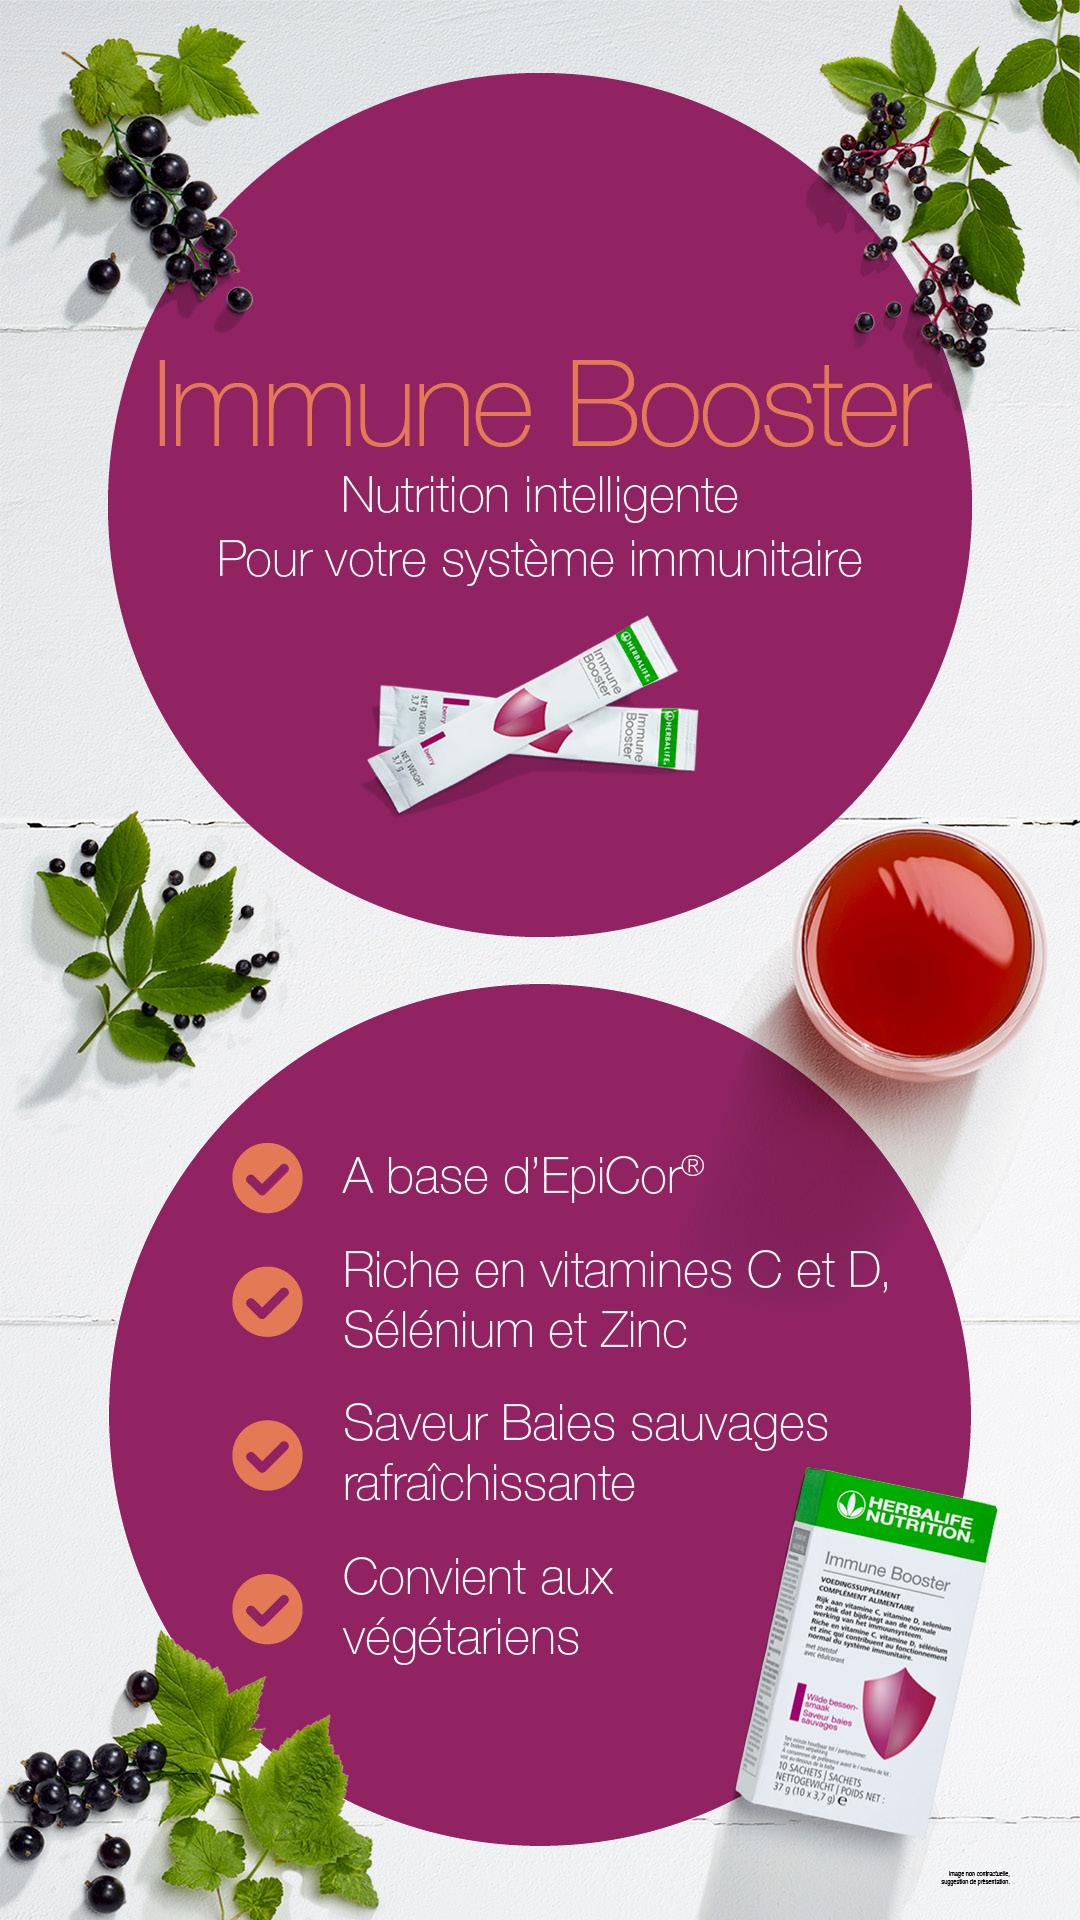 Immune Booster Herbalife Nutrition